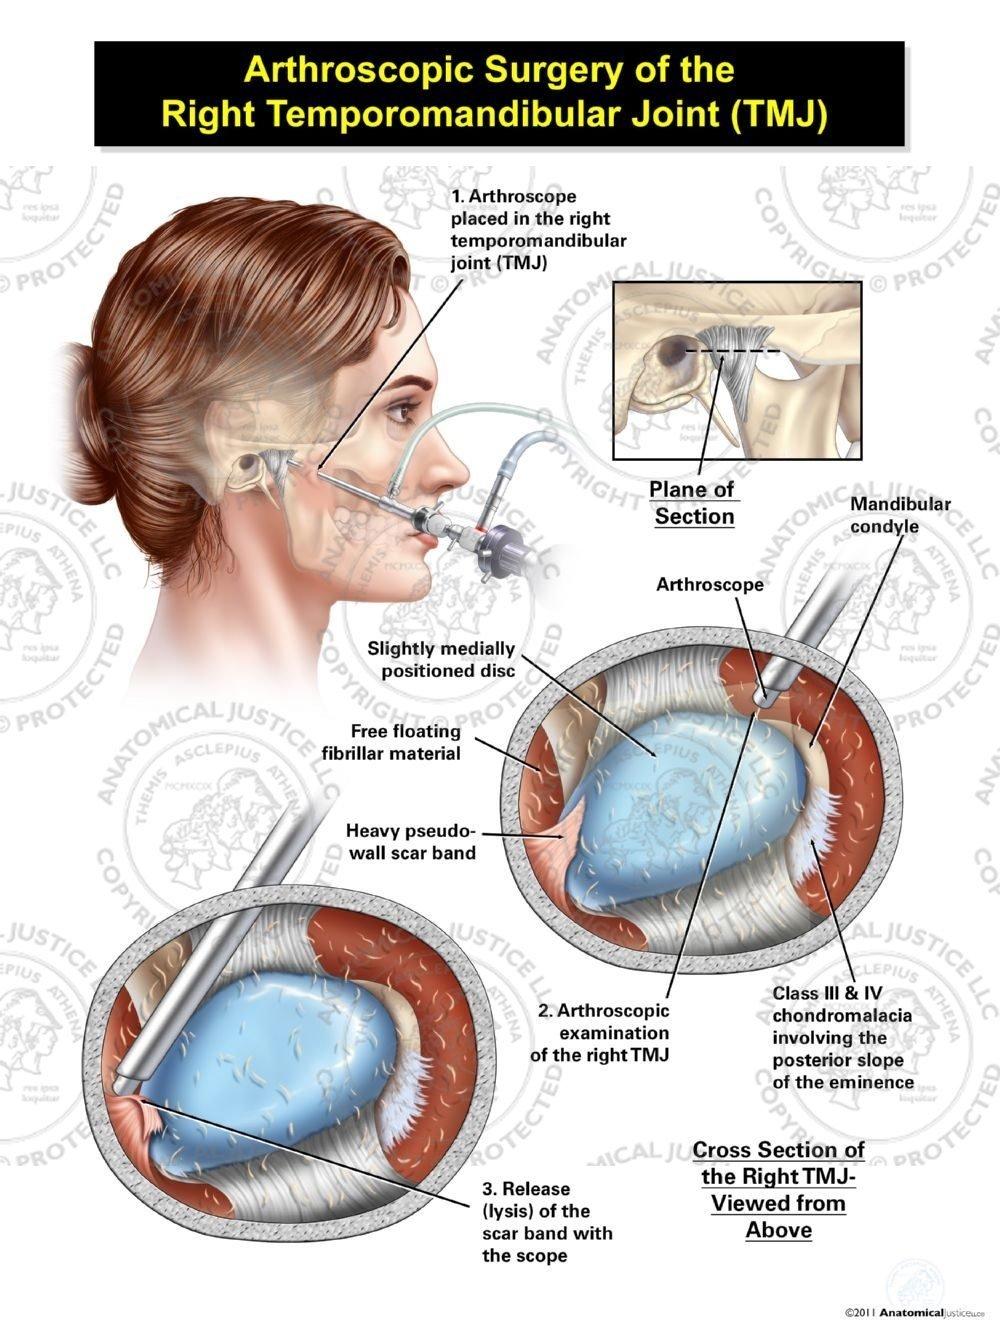 Female Arthroscopic Surgery Of The Right Temporomandibular Joint Tmj